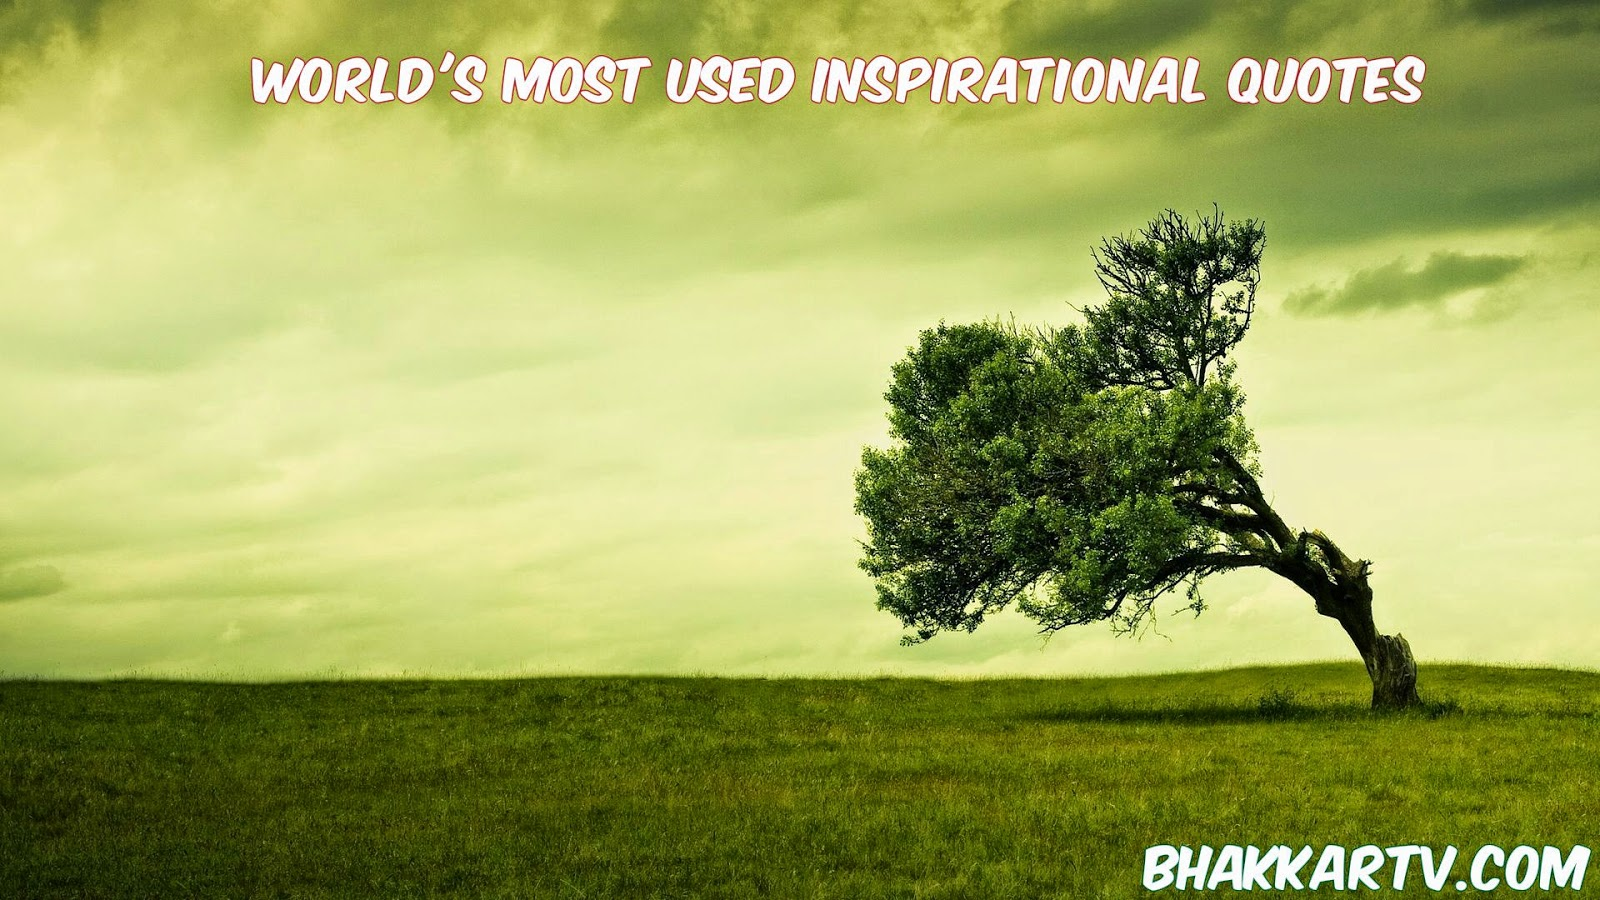 World's Most Used Inspirational Quotes - Bhakkartv.com